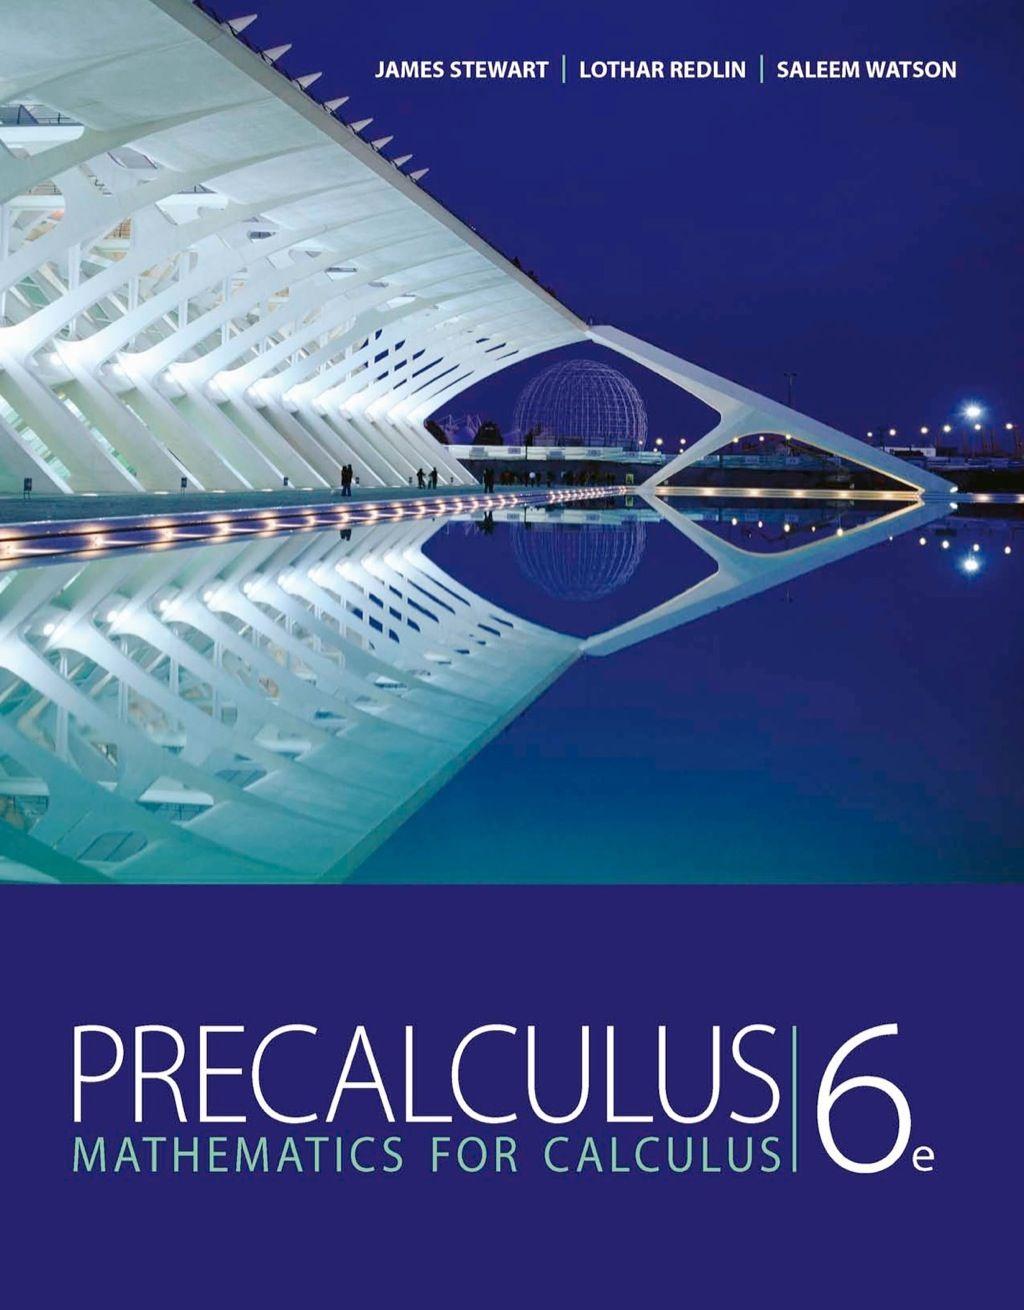 Precalculus Mathematics For Calculus EBook Rental In 2019